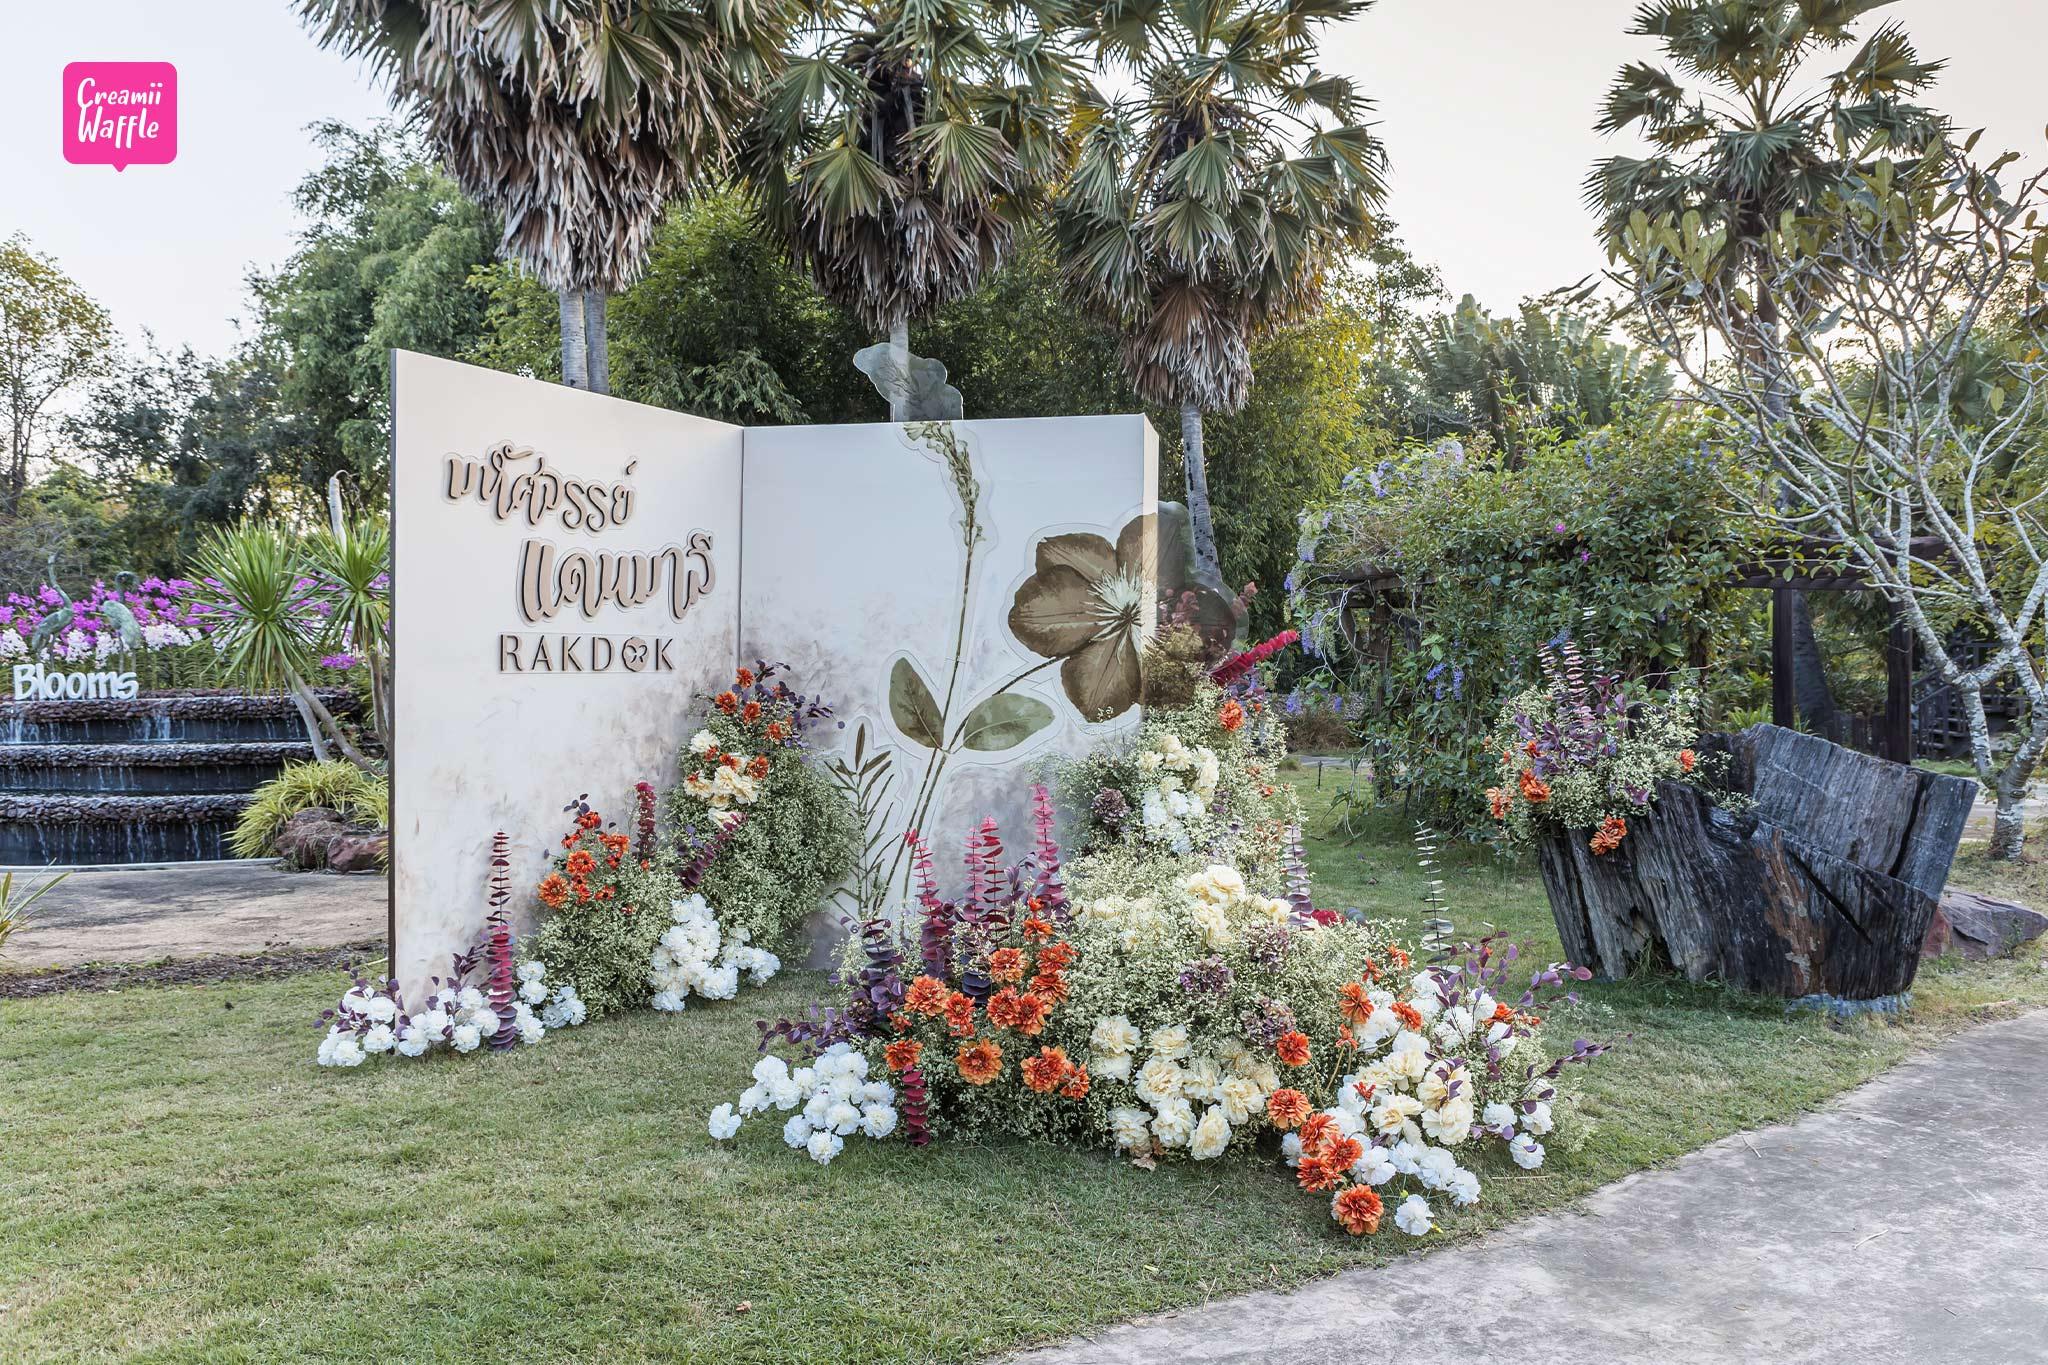 RAKDOK FLORAL DESTINATION มหัศจรรย์แดนมาลี นิทานดอกไม้ ราชบุรี